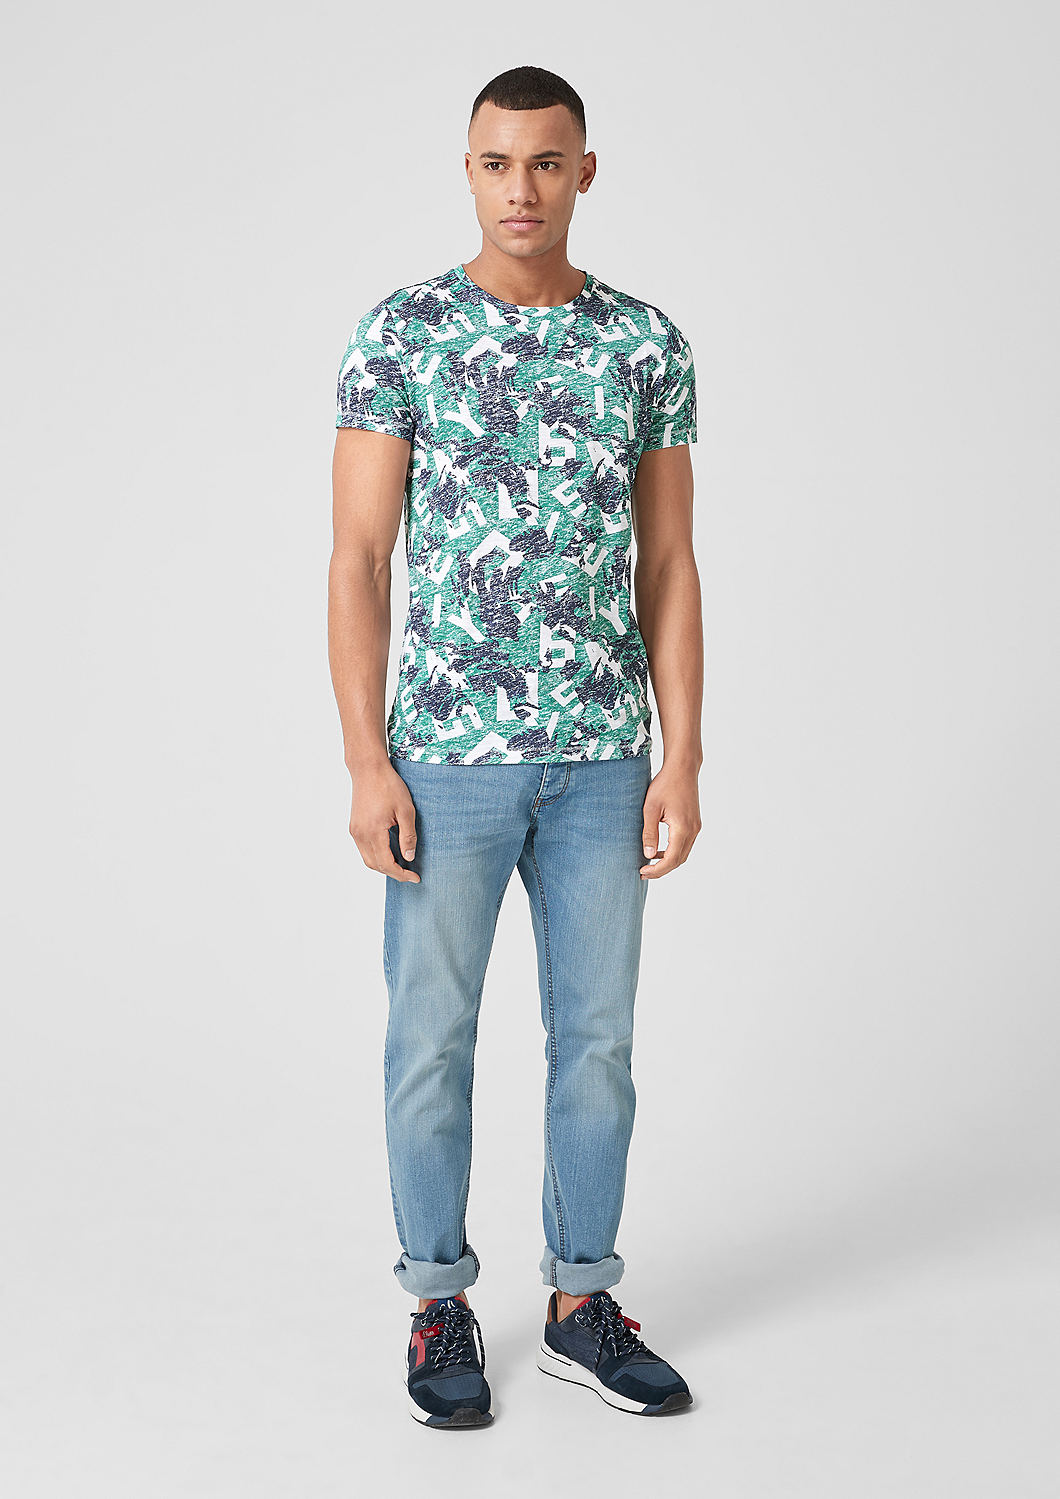 s.Oliver - T-Shirt mit Allover-Print - 1